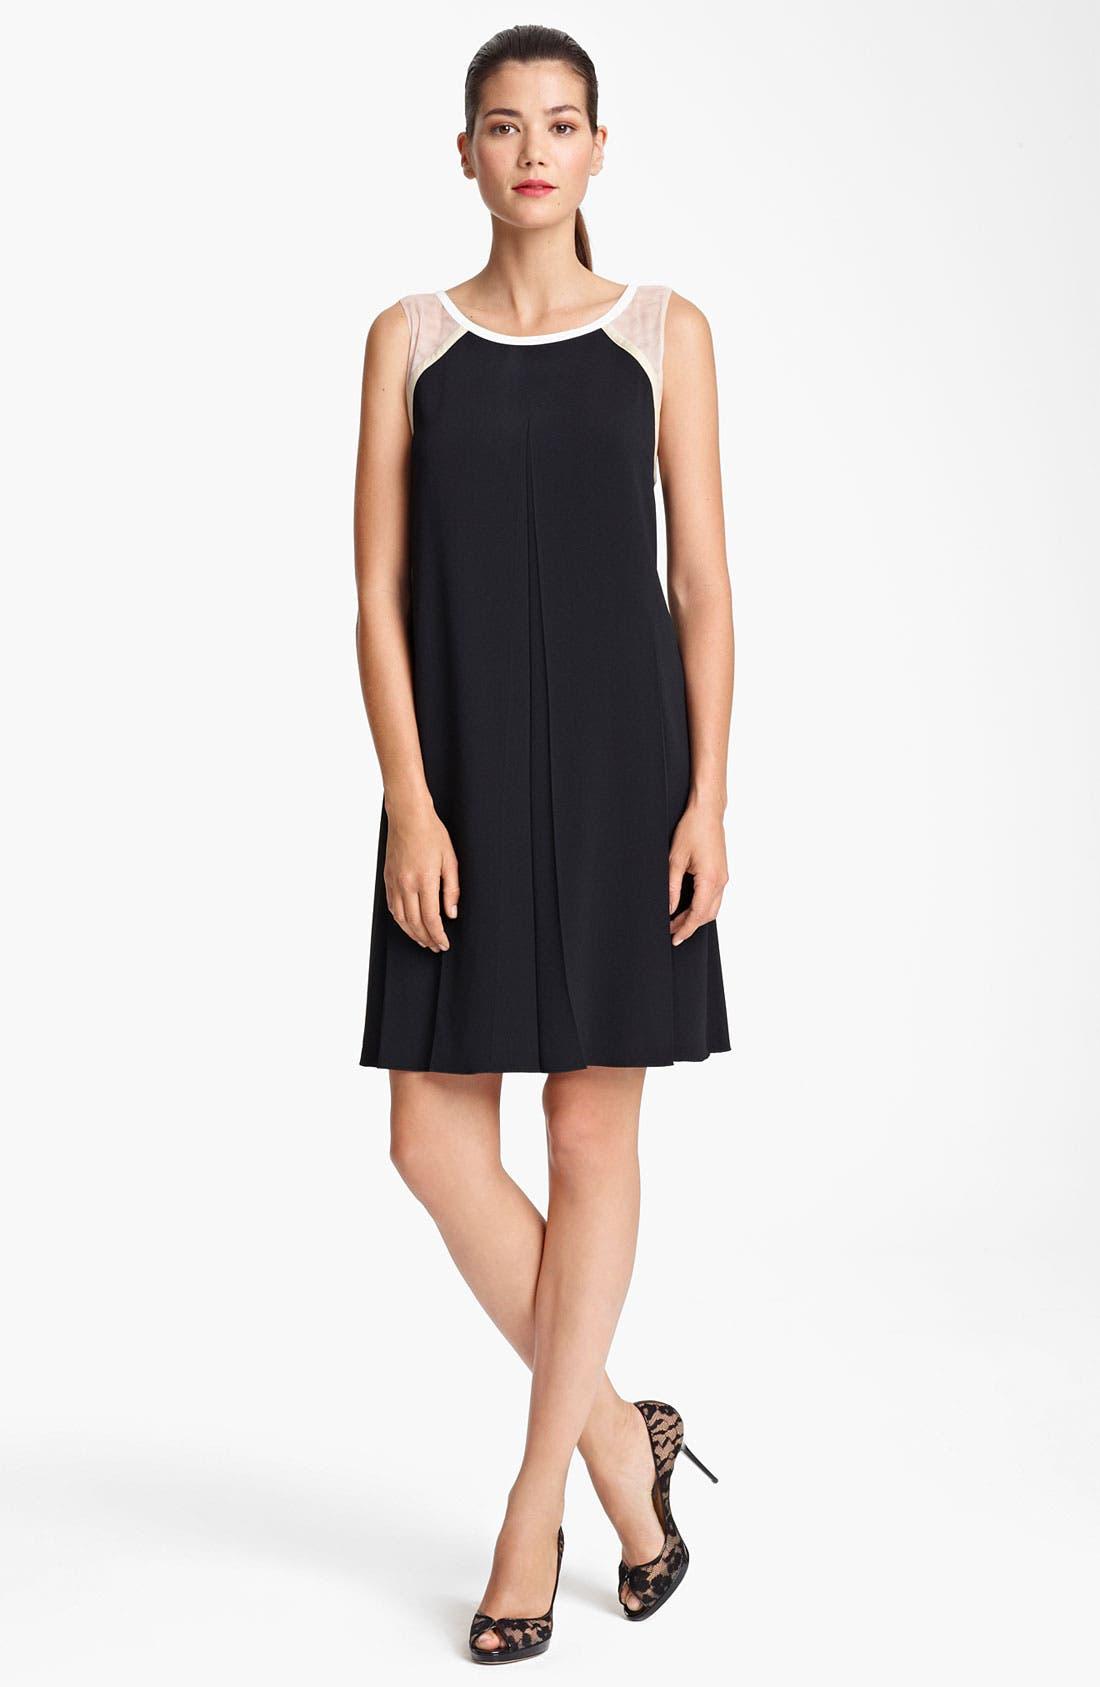 Alternate Image 1 Selected - Piazza Sempione Mesh Inset Crepe Dress